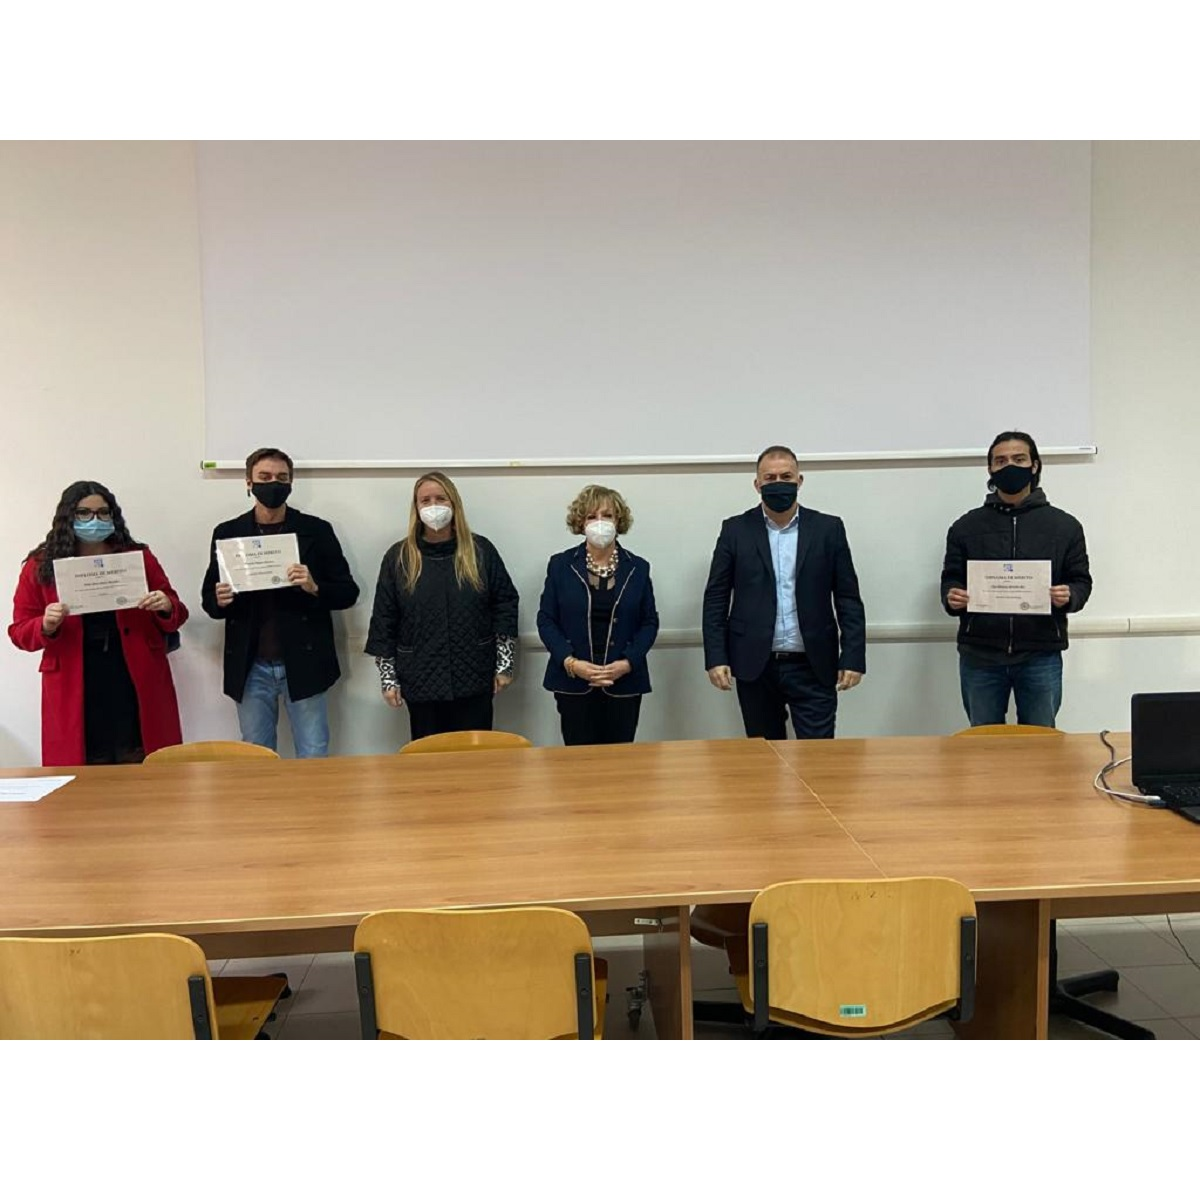 Premiati studenti meritevoli IIS Alessandrini Montesilvano foto